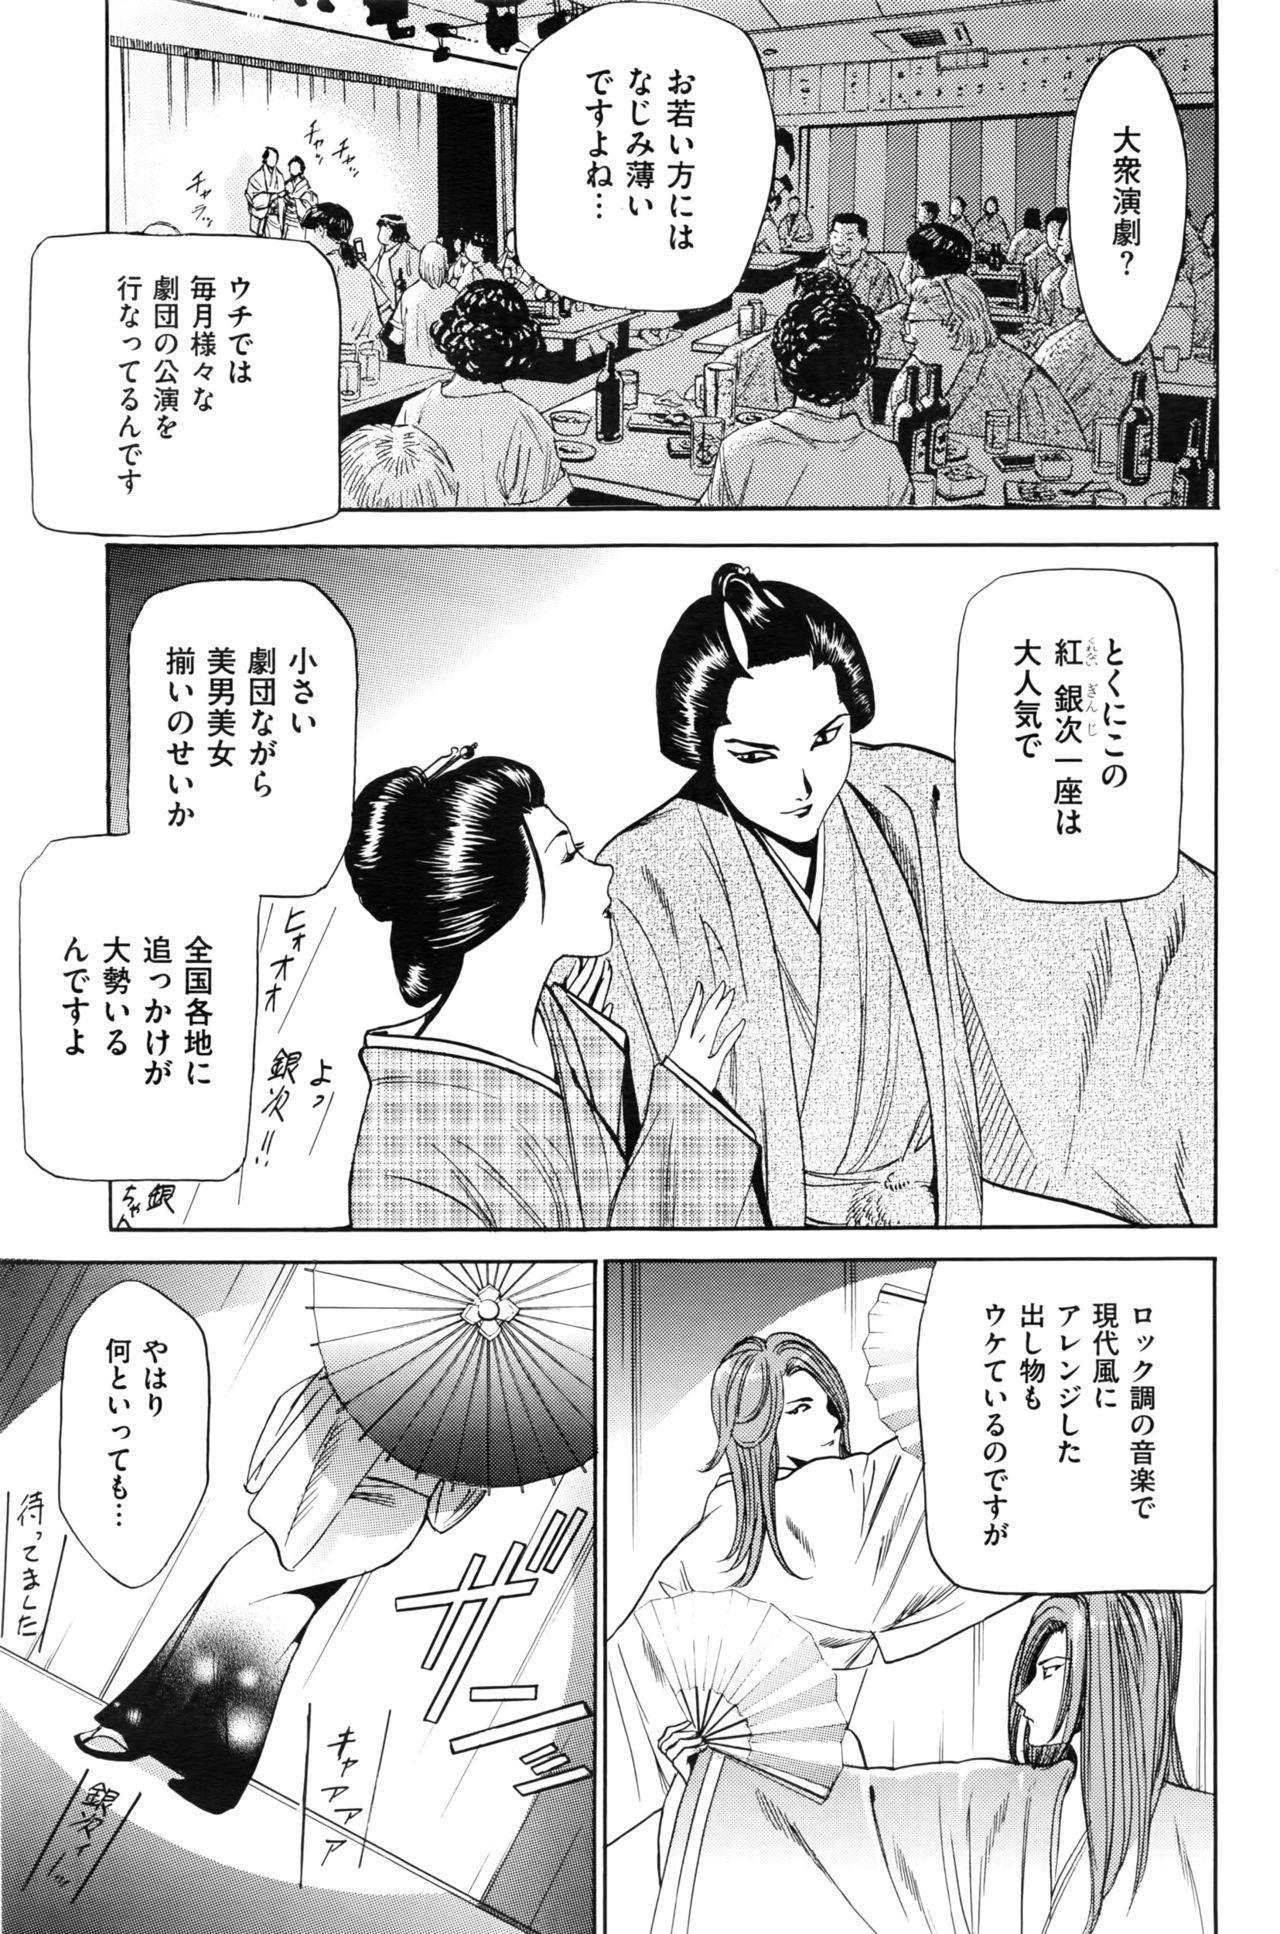 Wa Usuki Ipa a 1-10 57